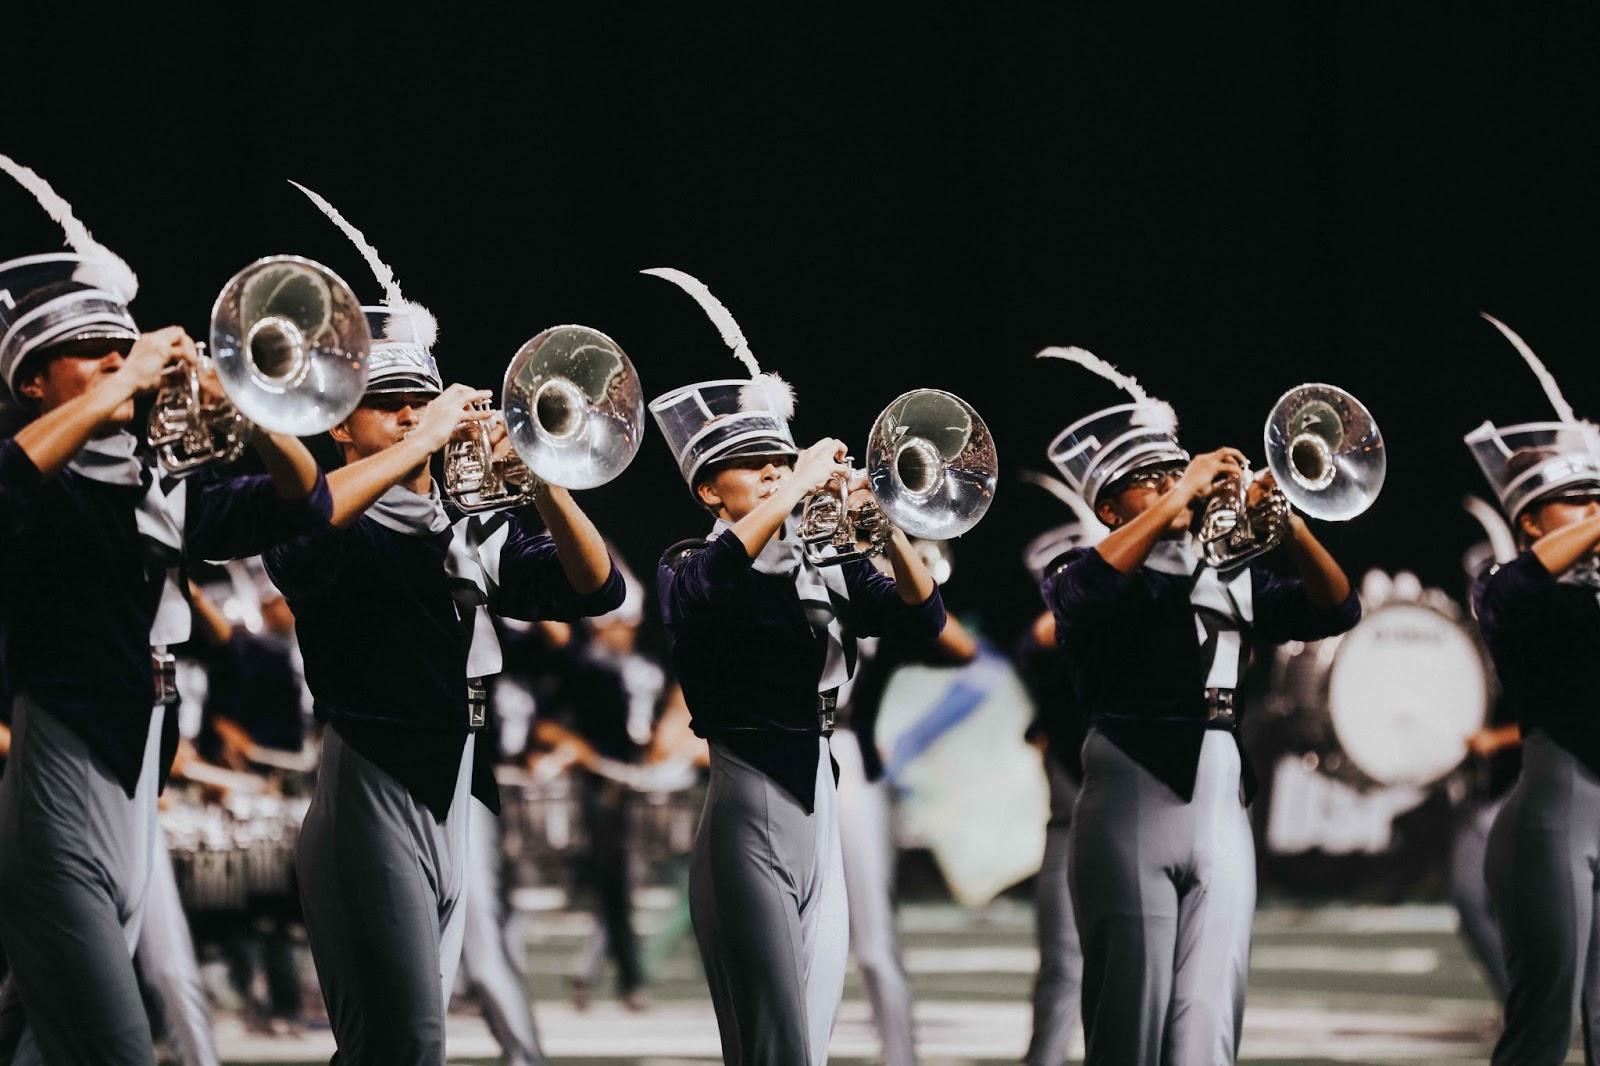 Carolina Crown brass performs at DCI World Finals